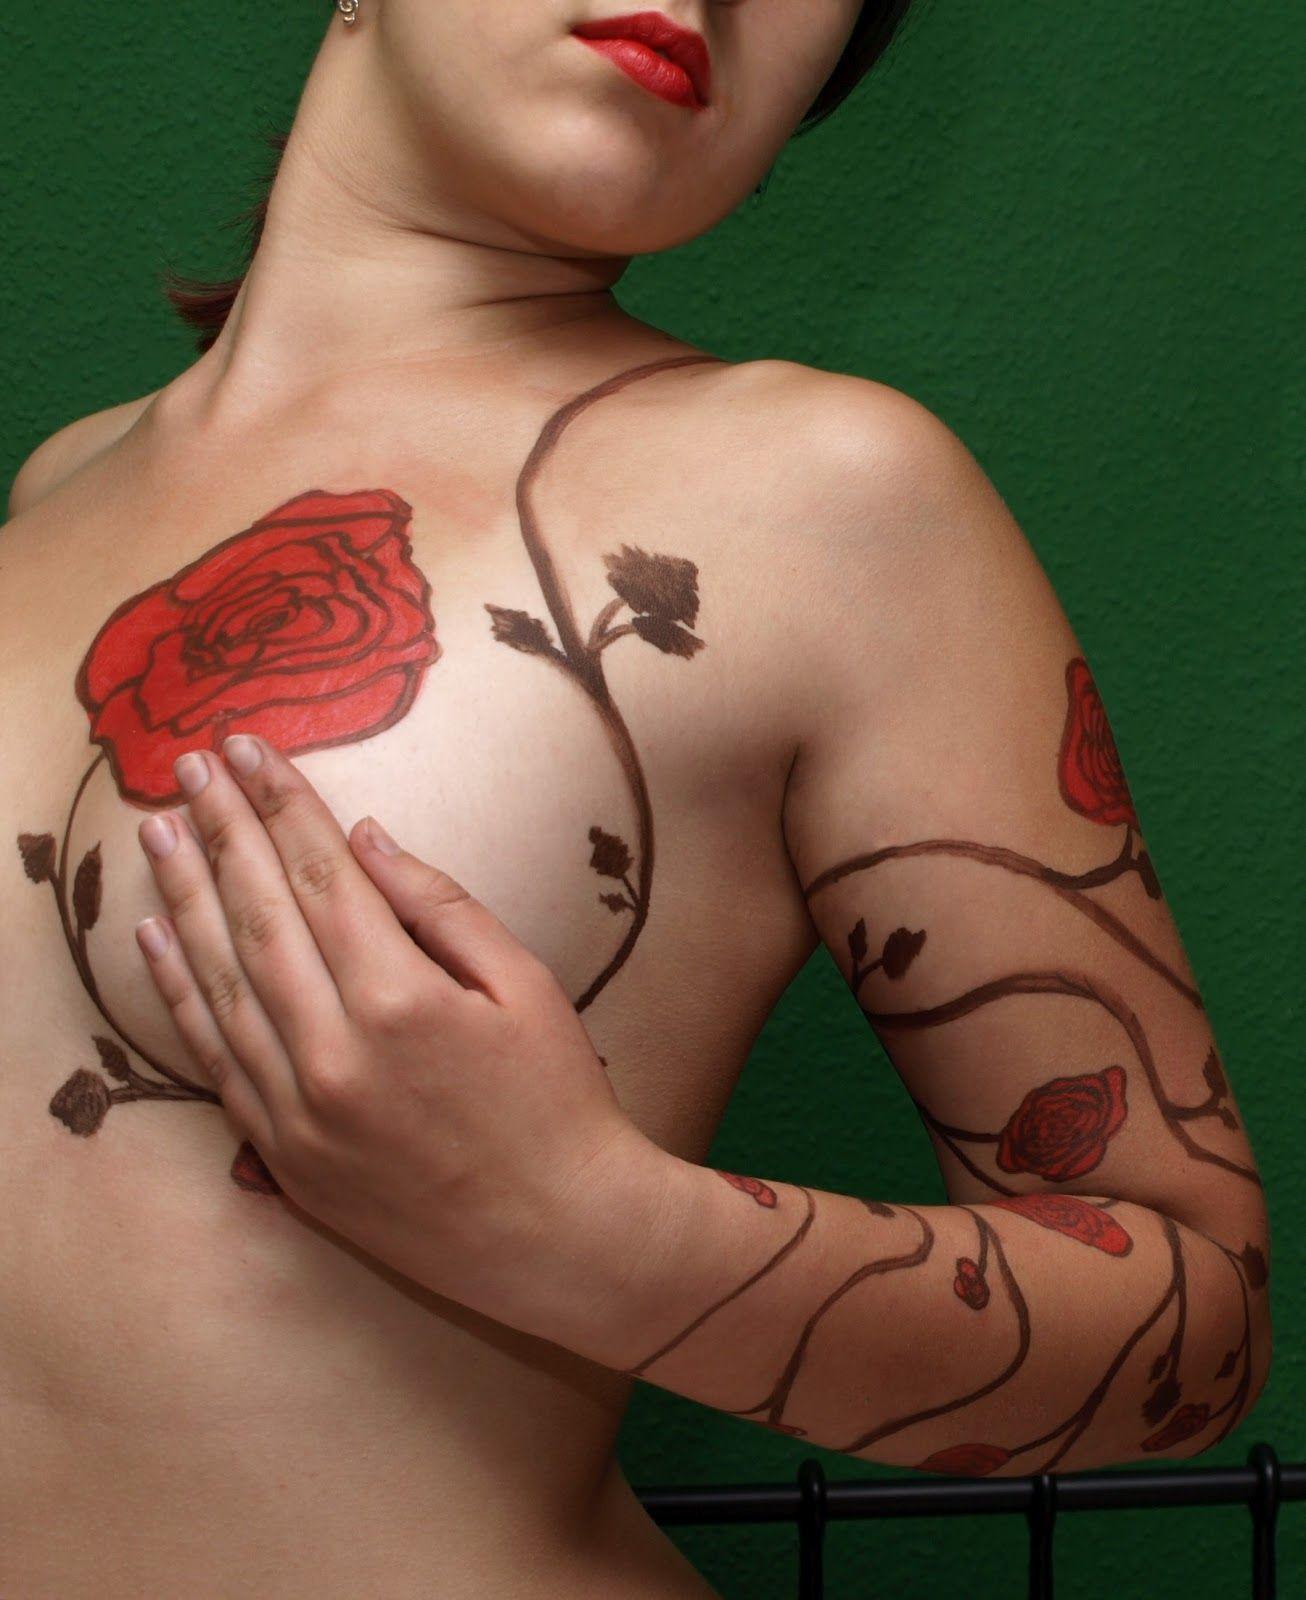 women's flower tatttoos | Flower Tattoos Designs, Rose Flower Tattoo Design On Girls Body: Find ...